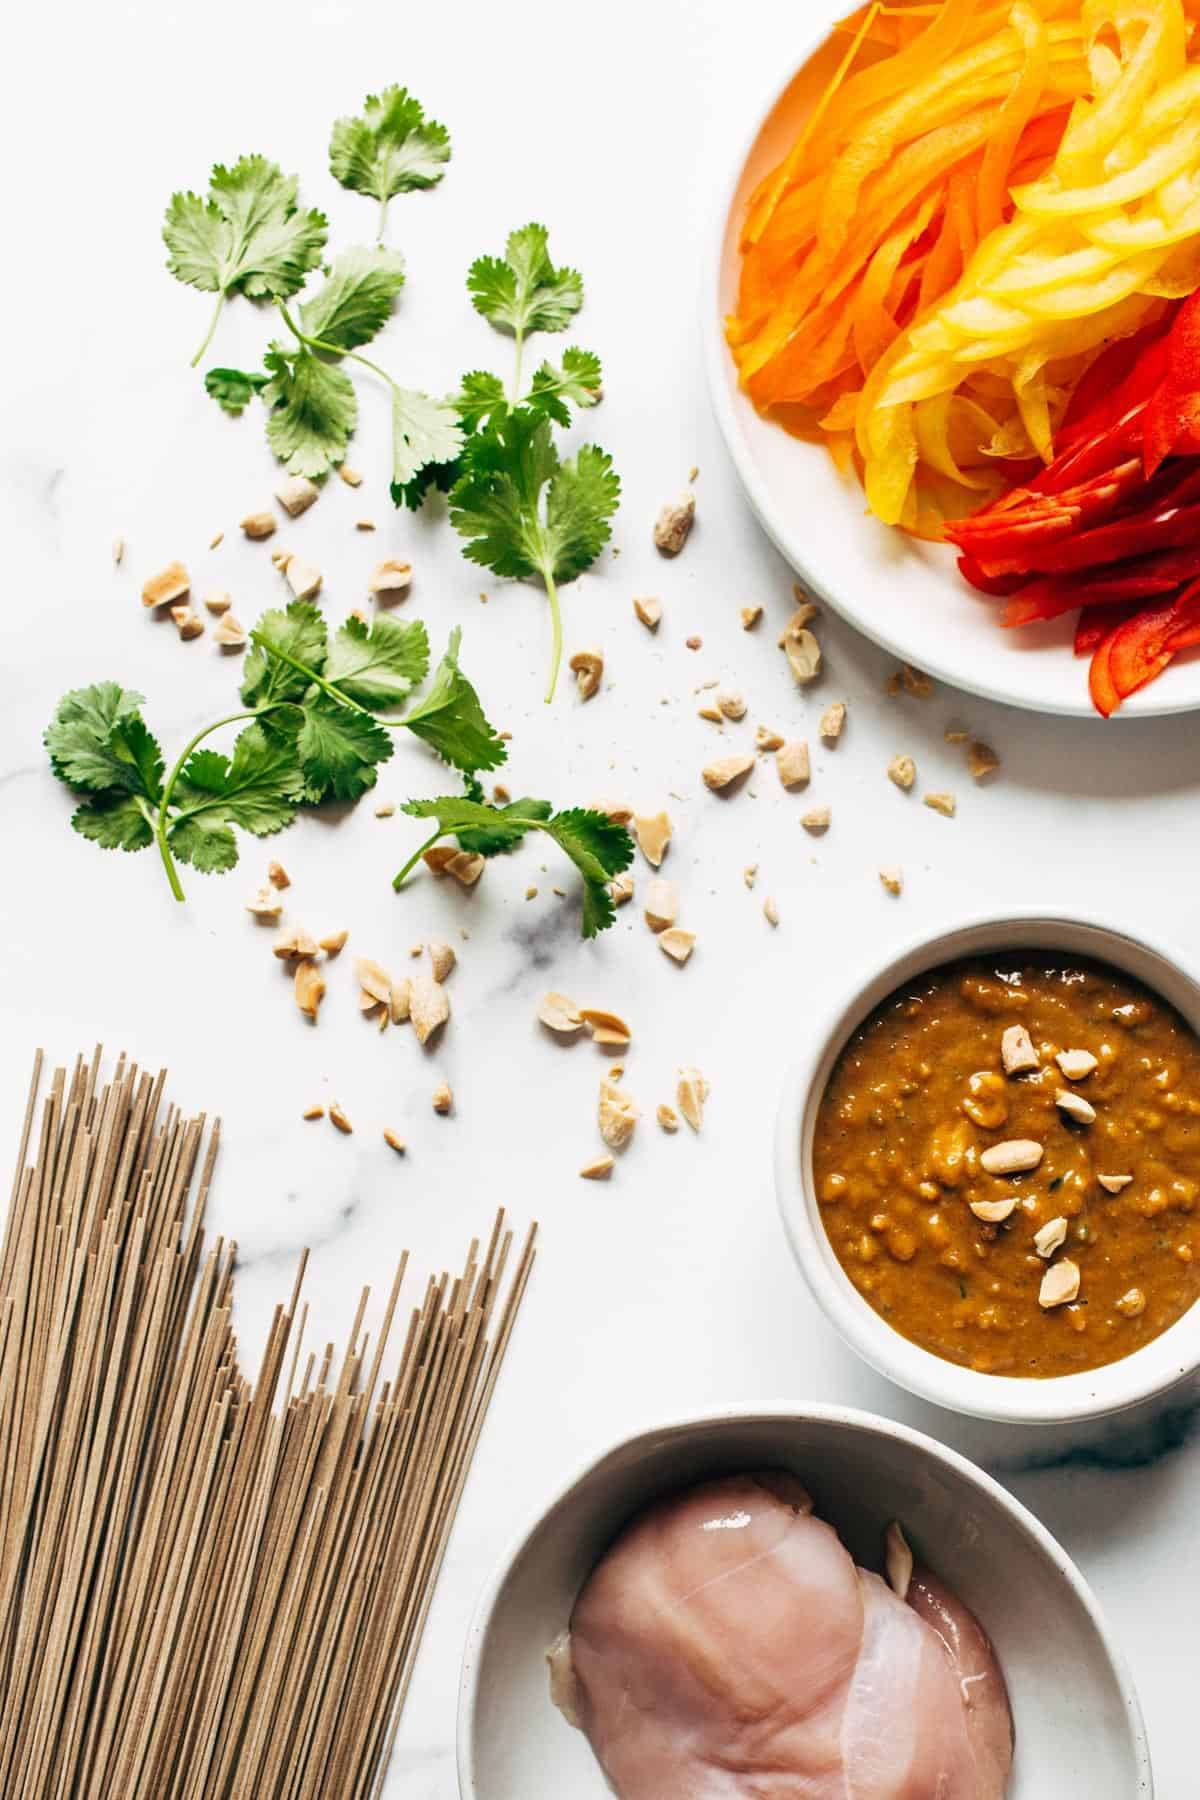 Ingredients for Spicy Peanut Soba Noodle Salad.